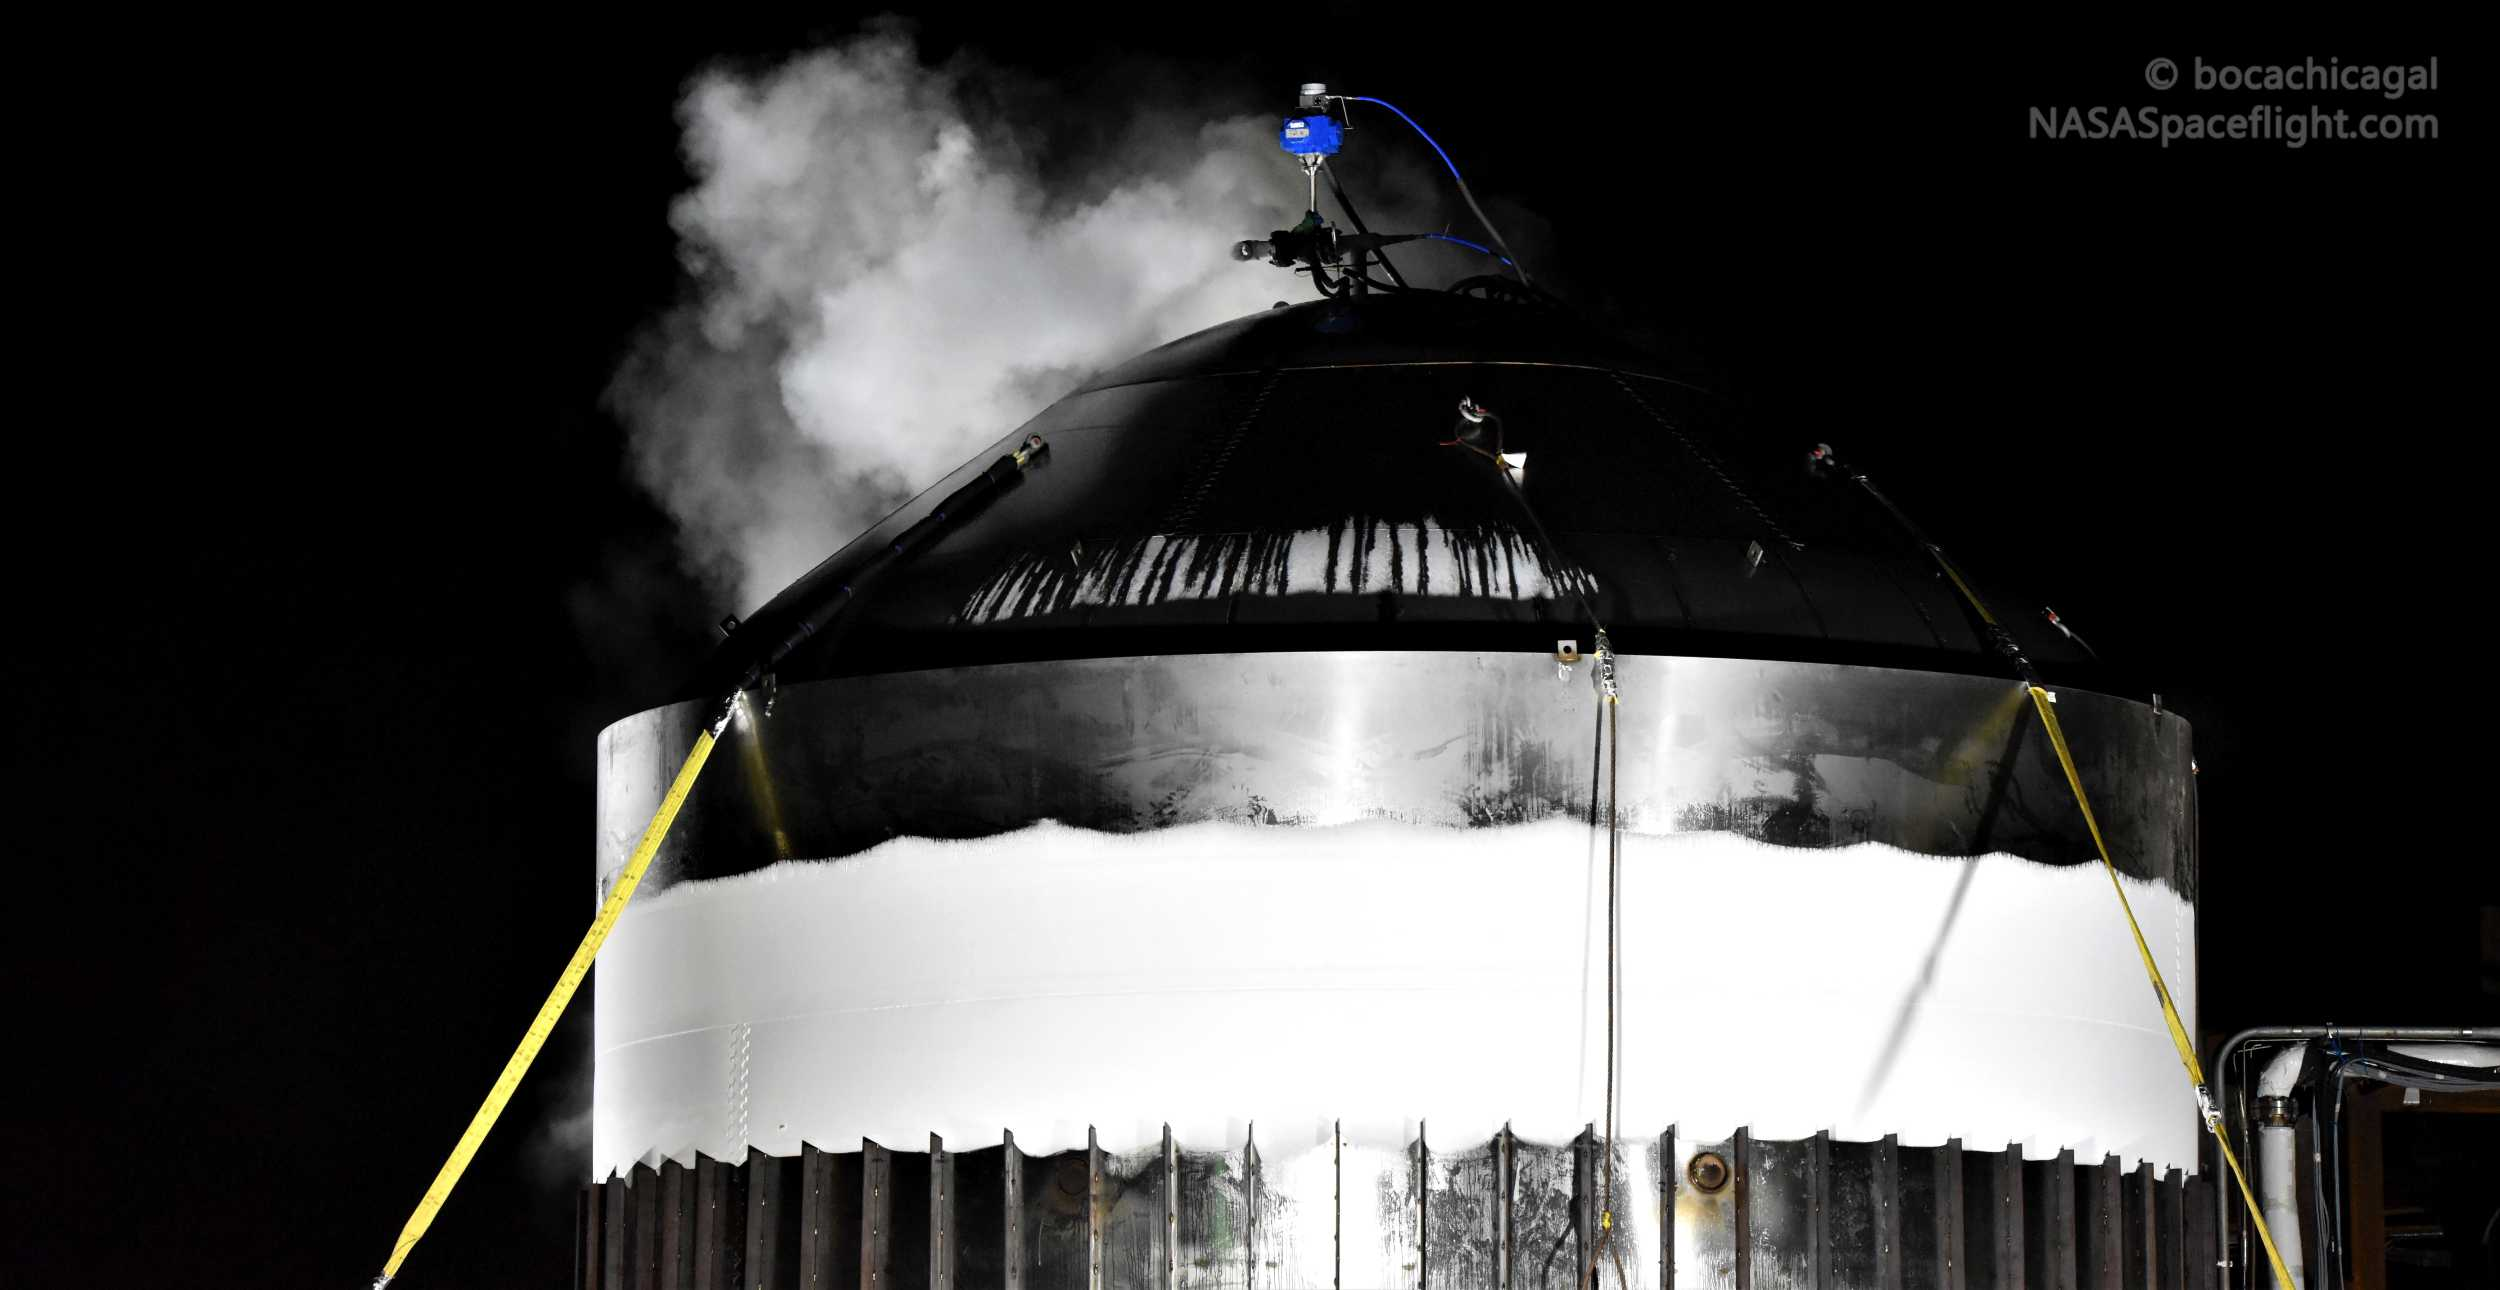 Starship Boca Chica 012820 (NASASpaceflight – bocachicagal) frosty test tank #2 4 wide (c)